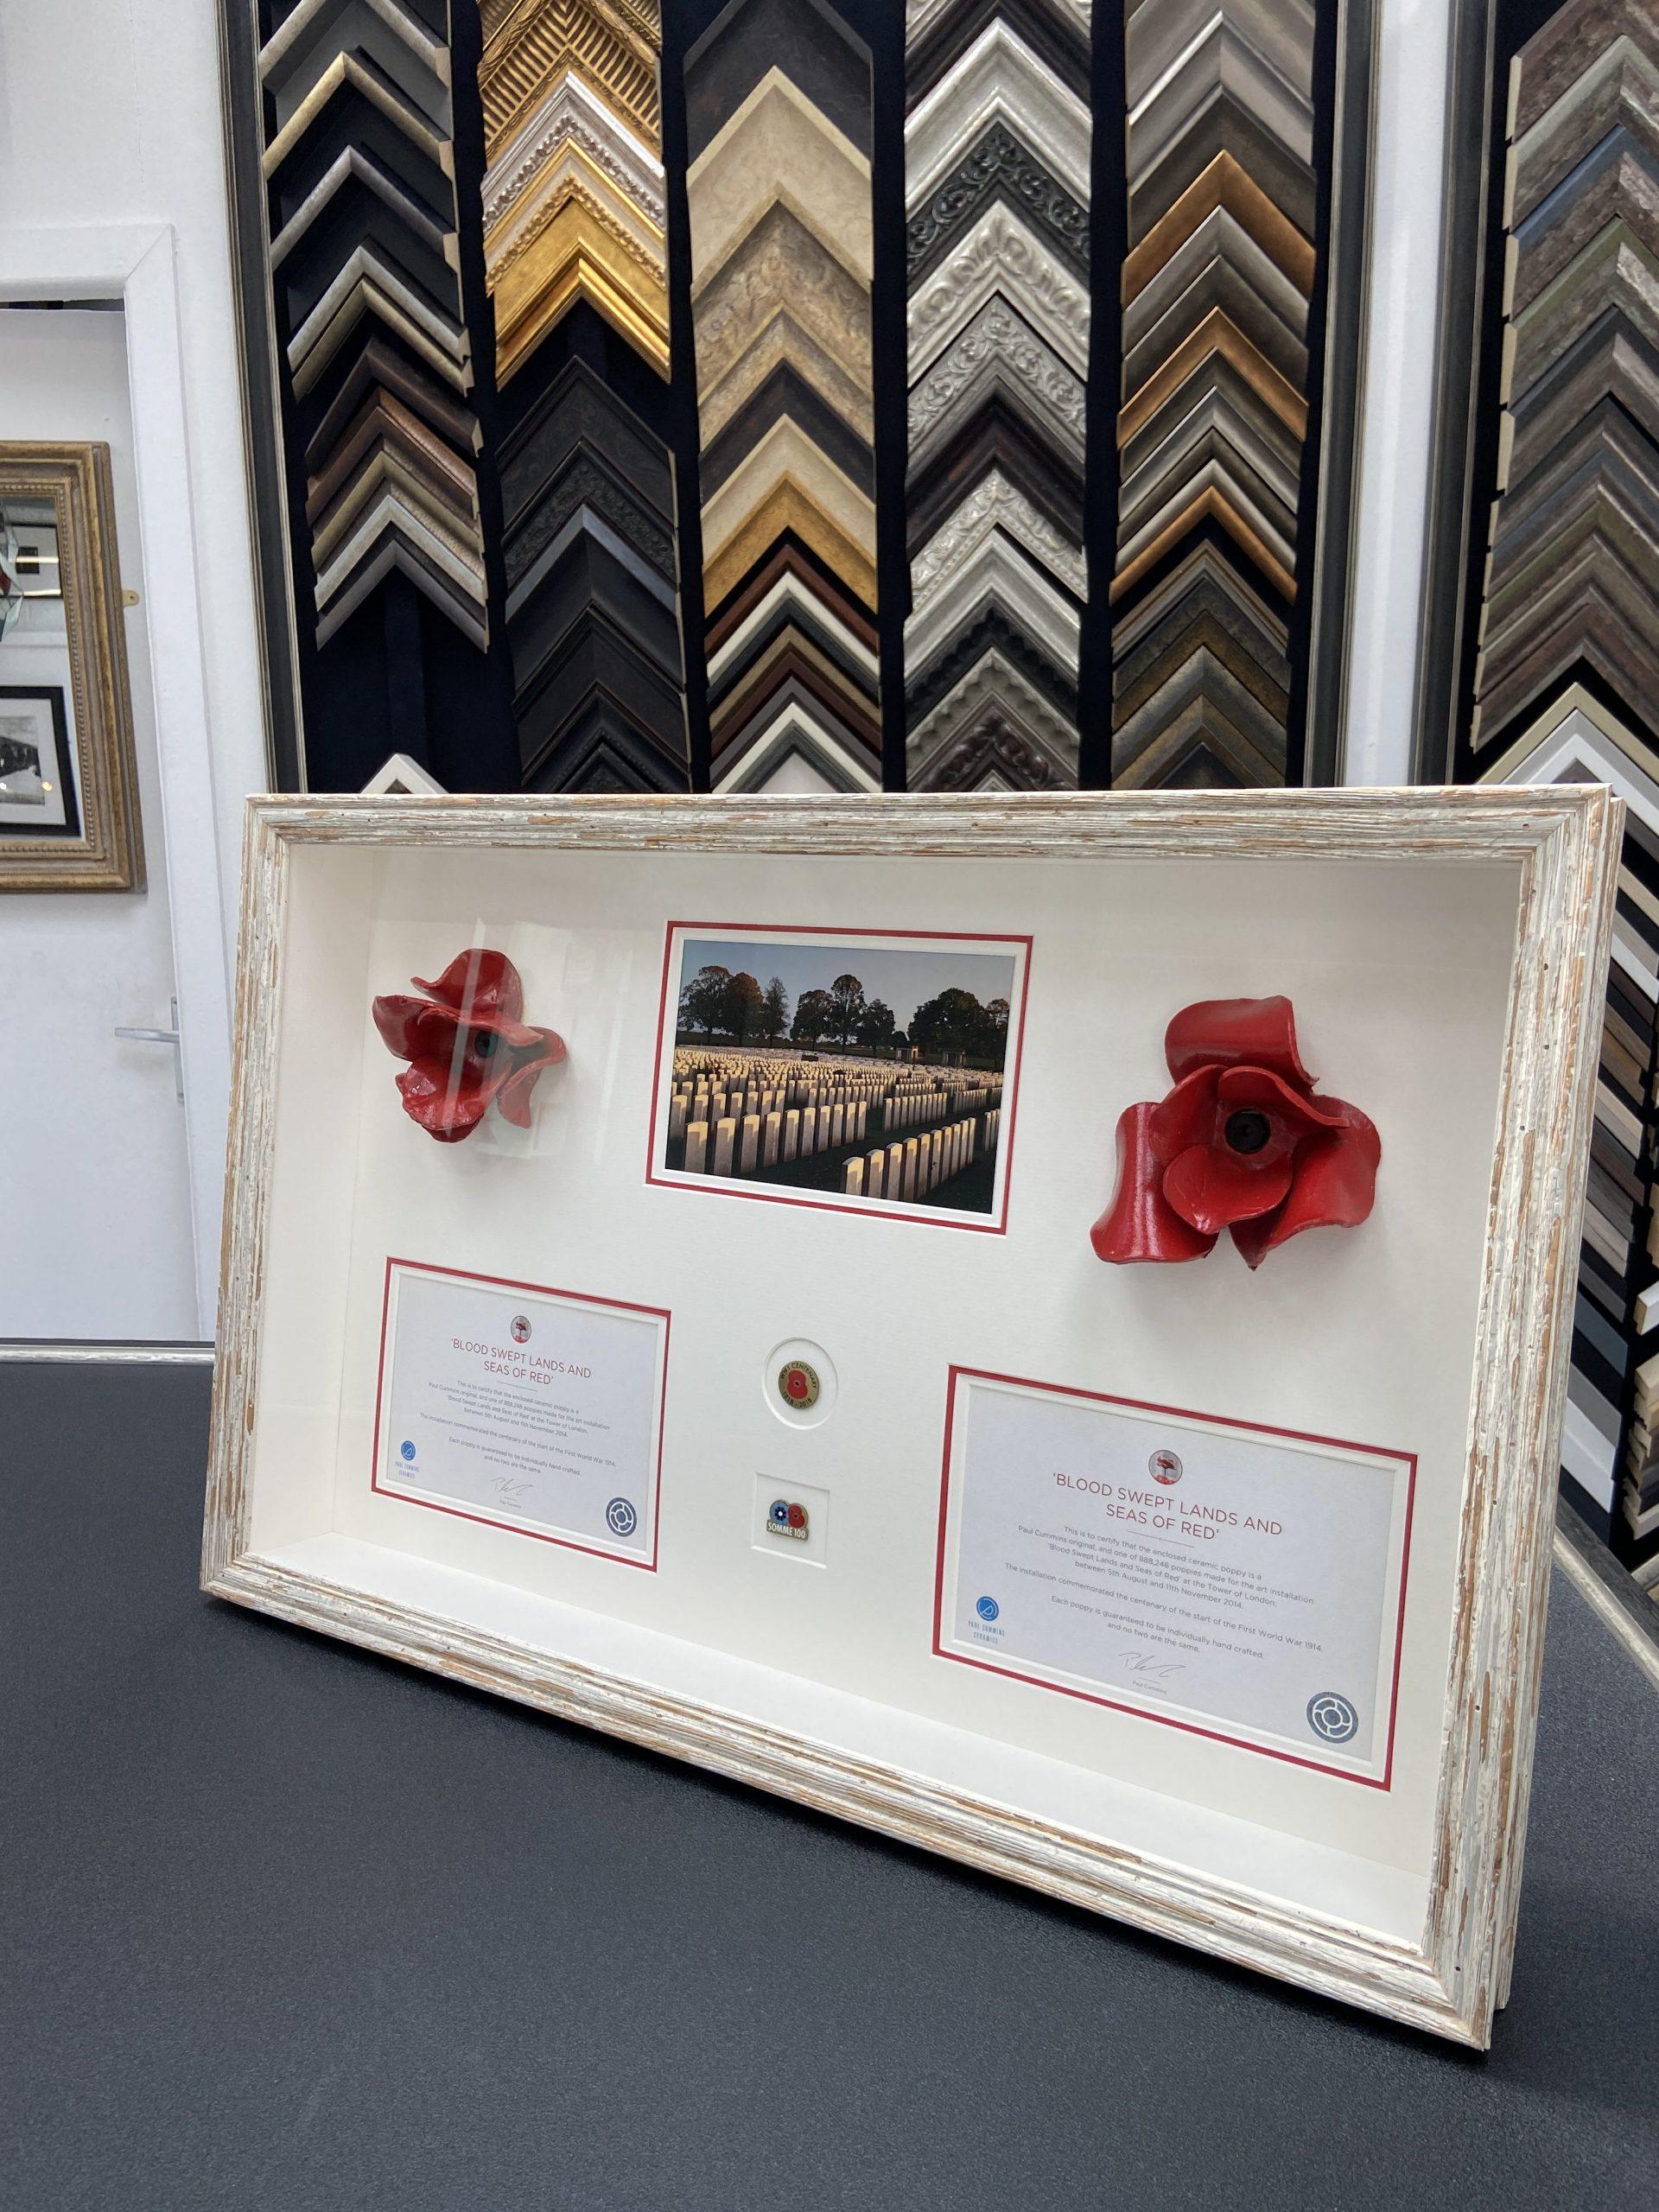 Ceramic Poppies framed in Larson Juhl Brittany Moulding